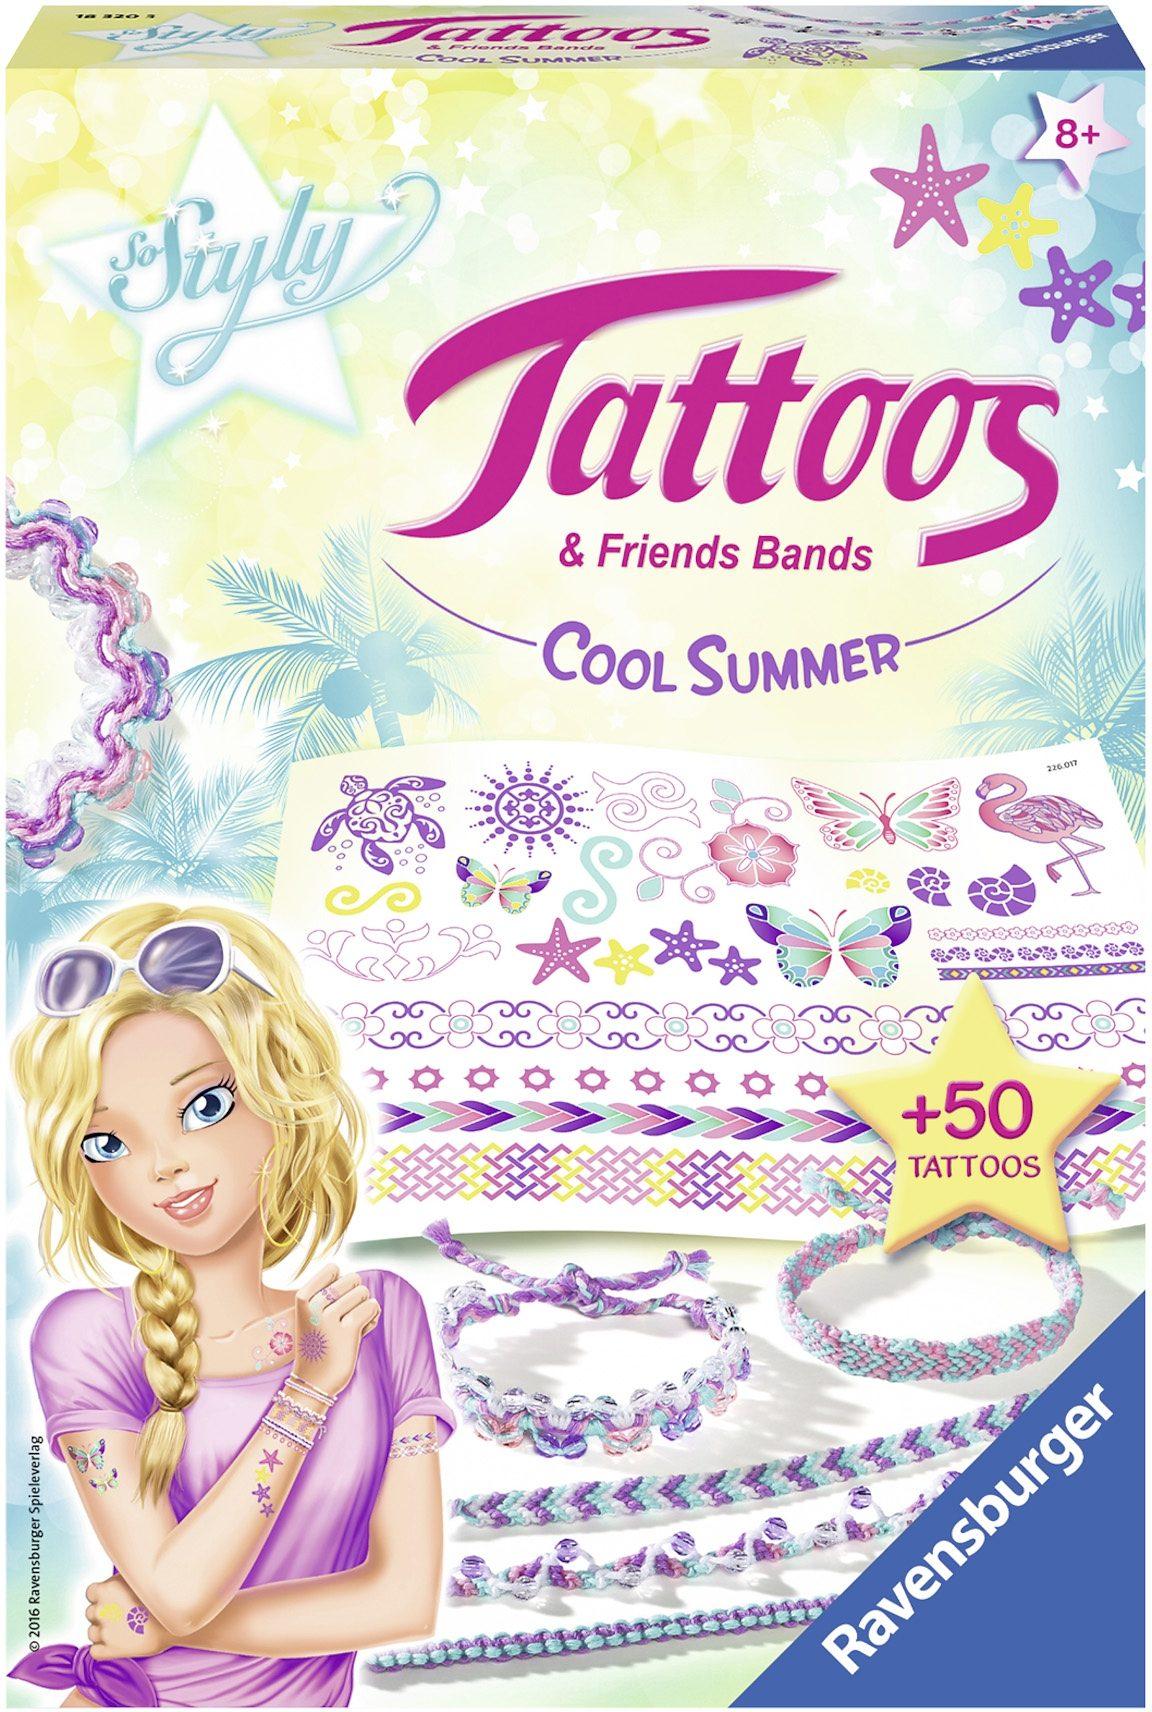 Ravensburger Tattoo und Freundschaftsbänder, »So Styly Tattoos & Friends Bands Cool Summer«